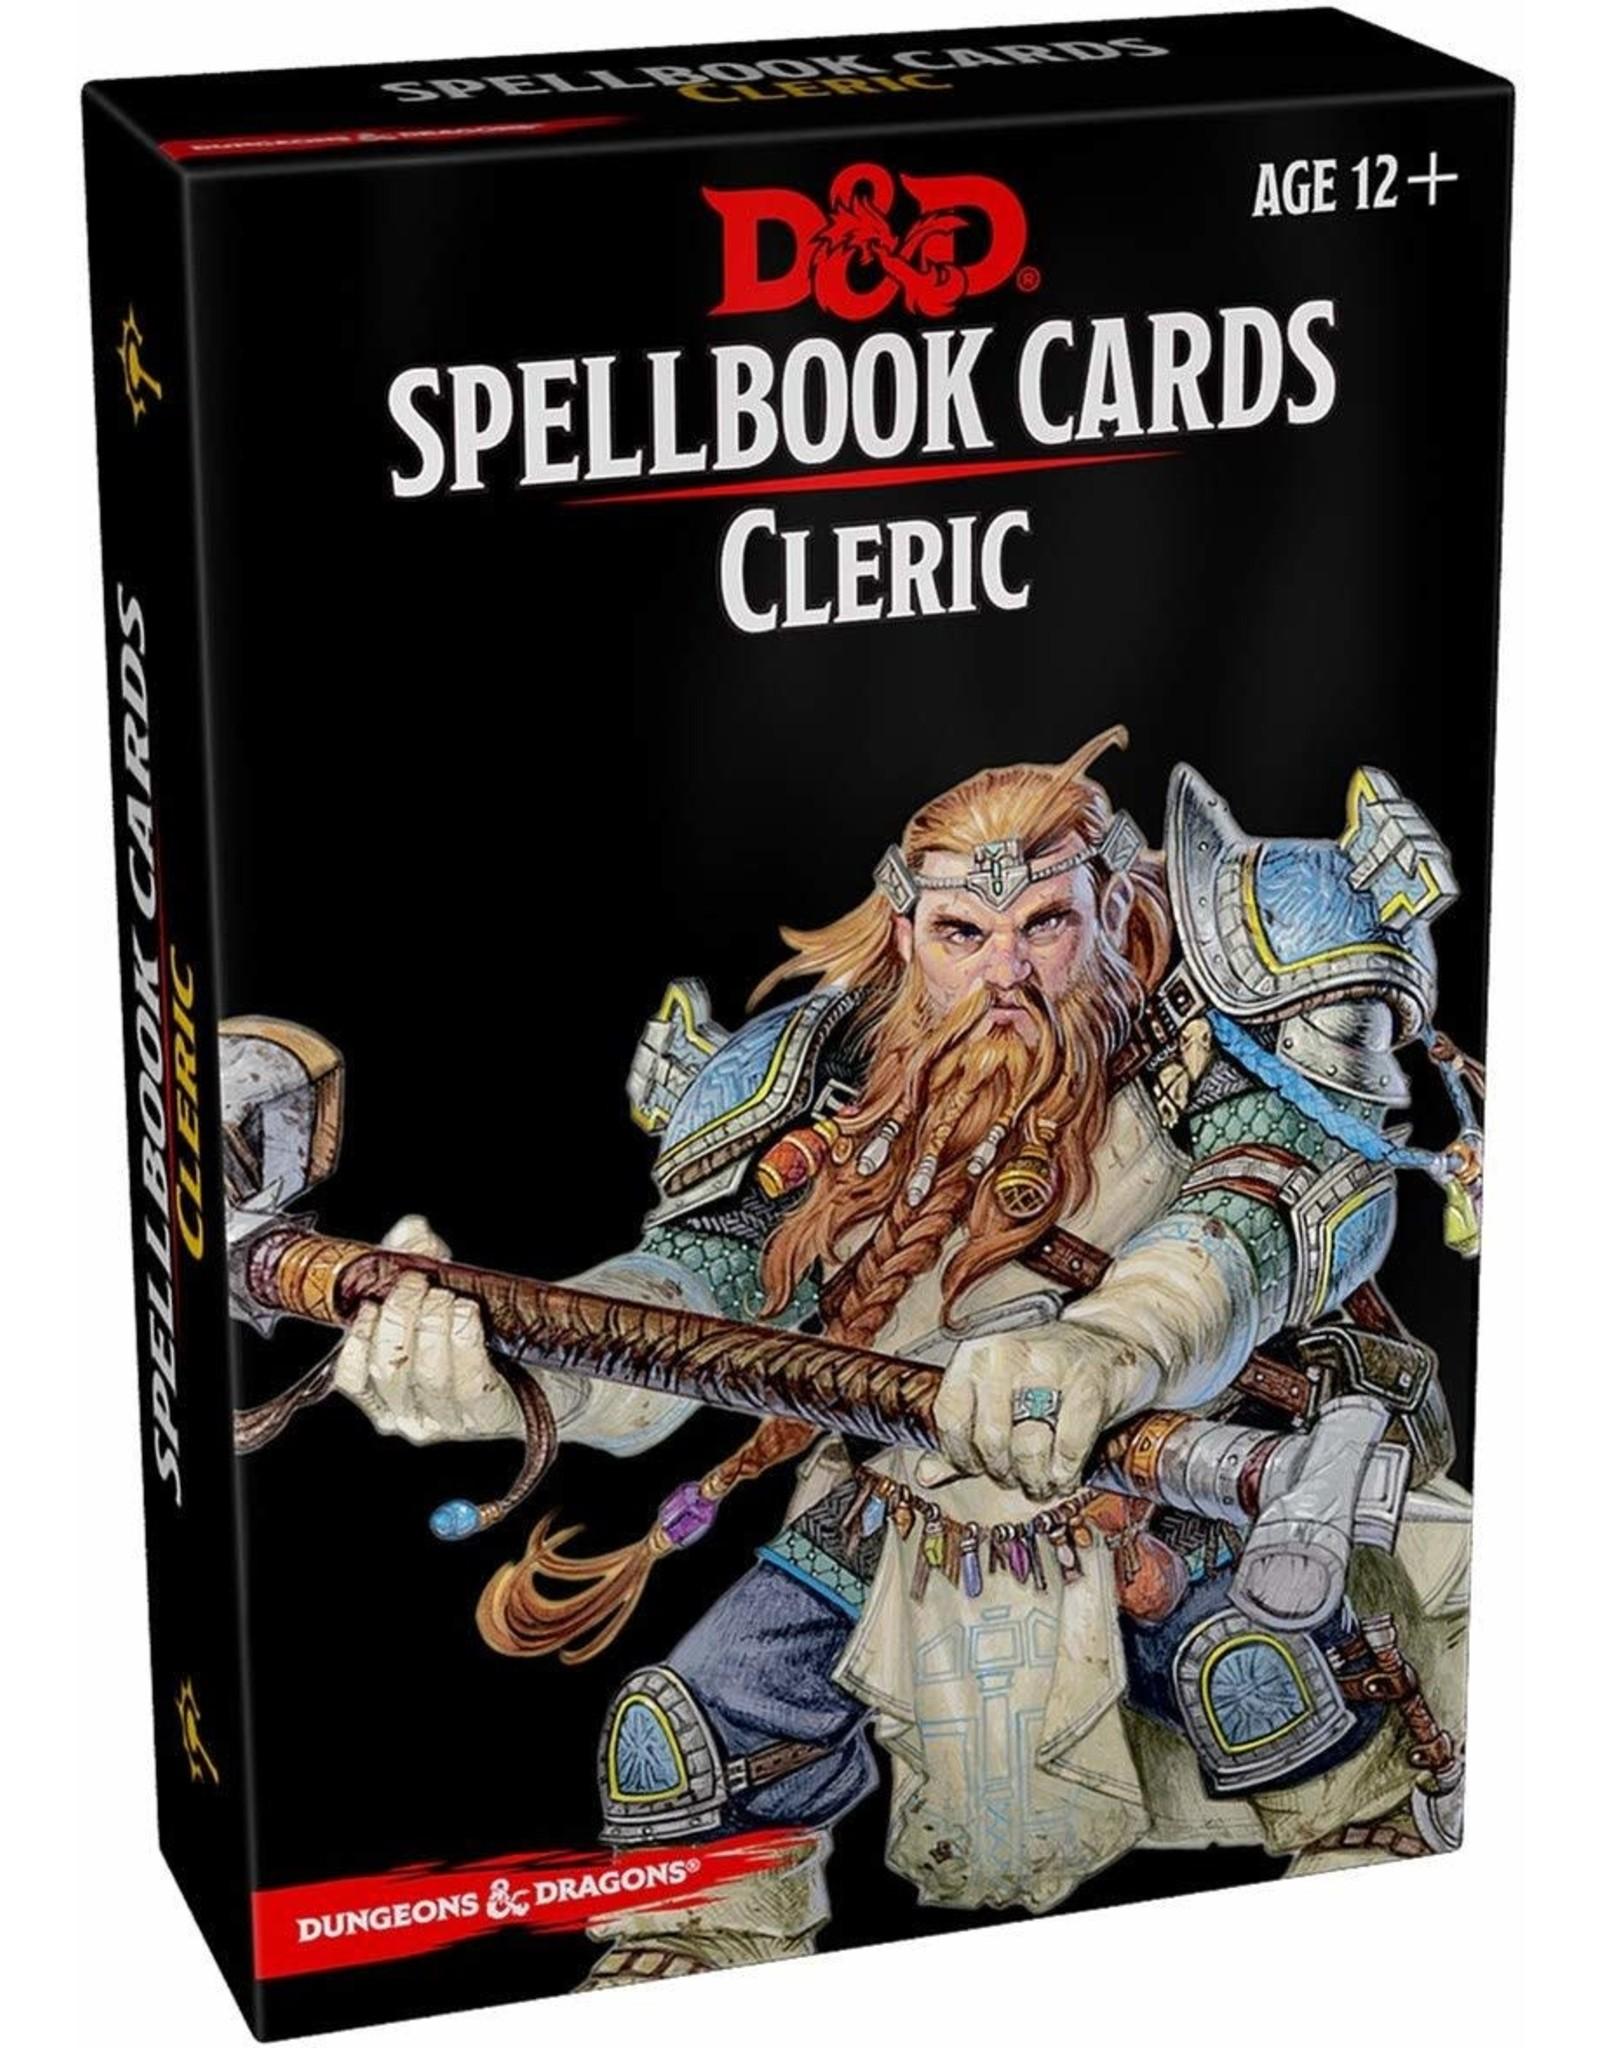 GaleForce9 D&D: Spellbook Cards: Cleric Deck